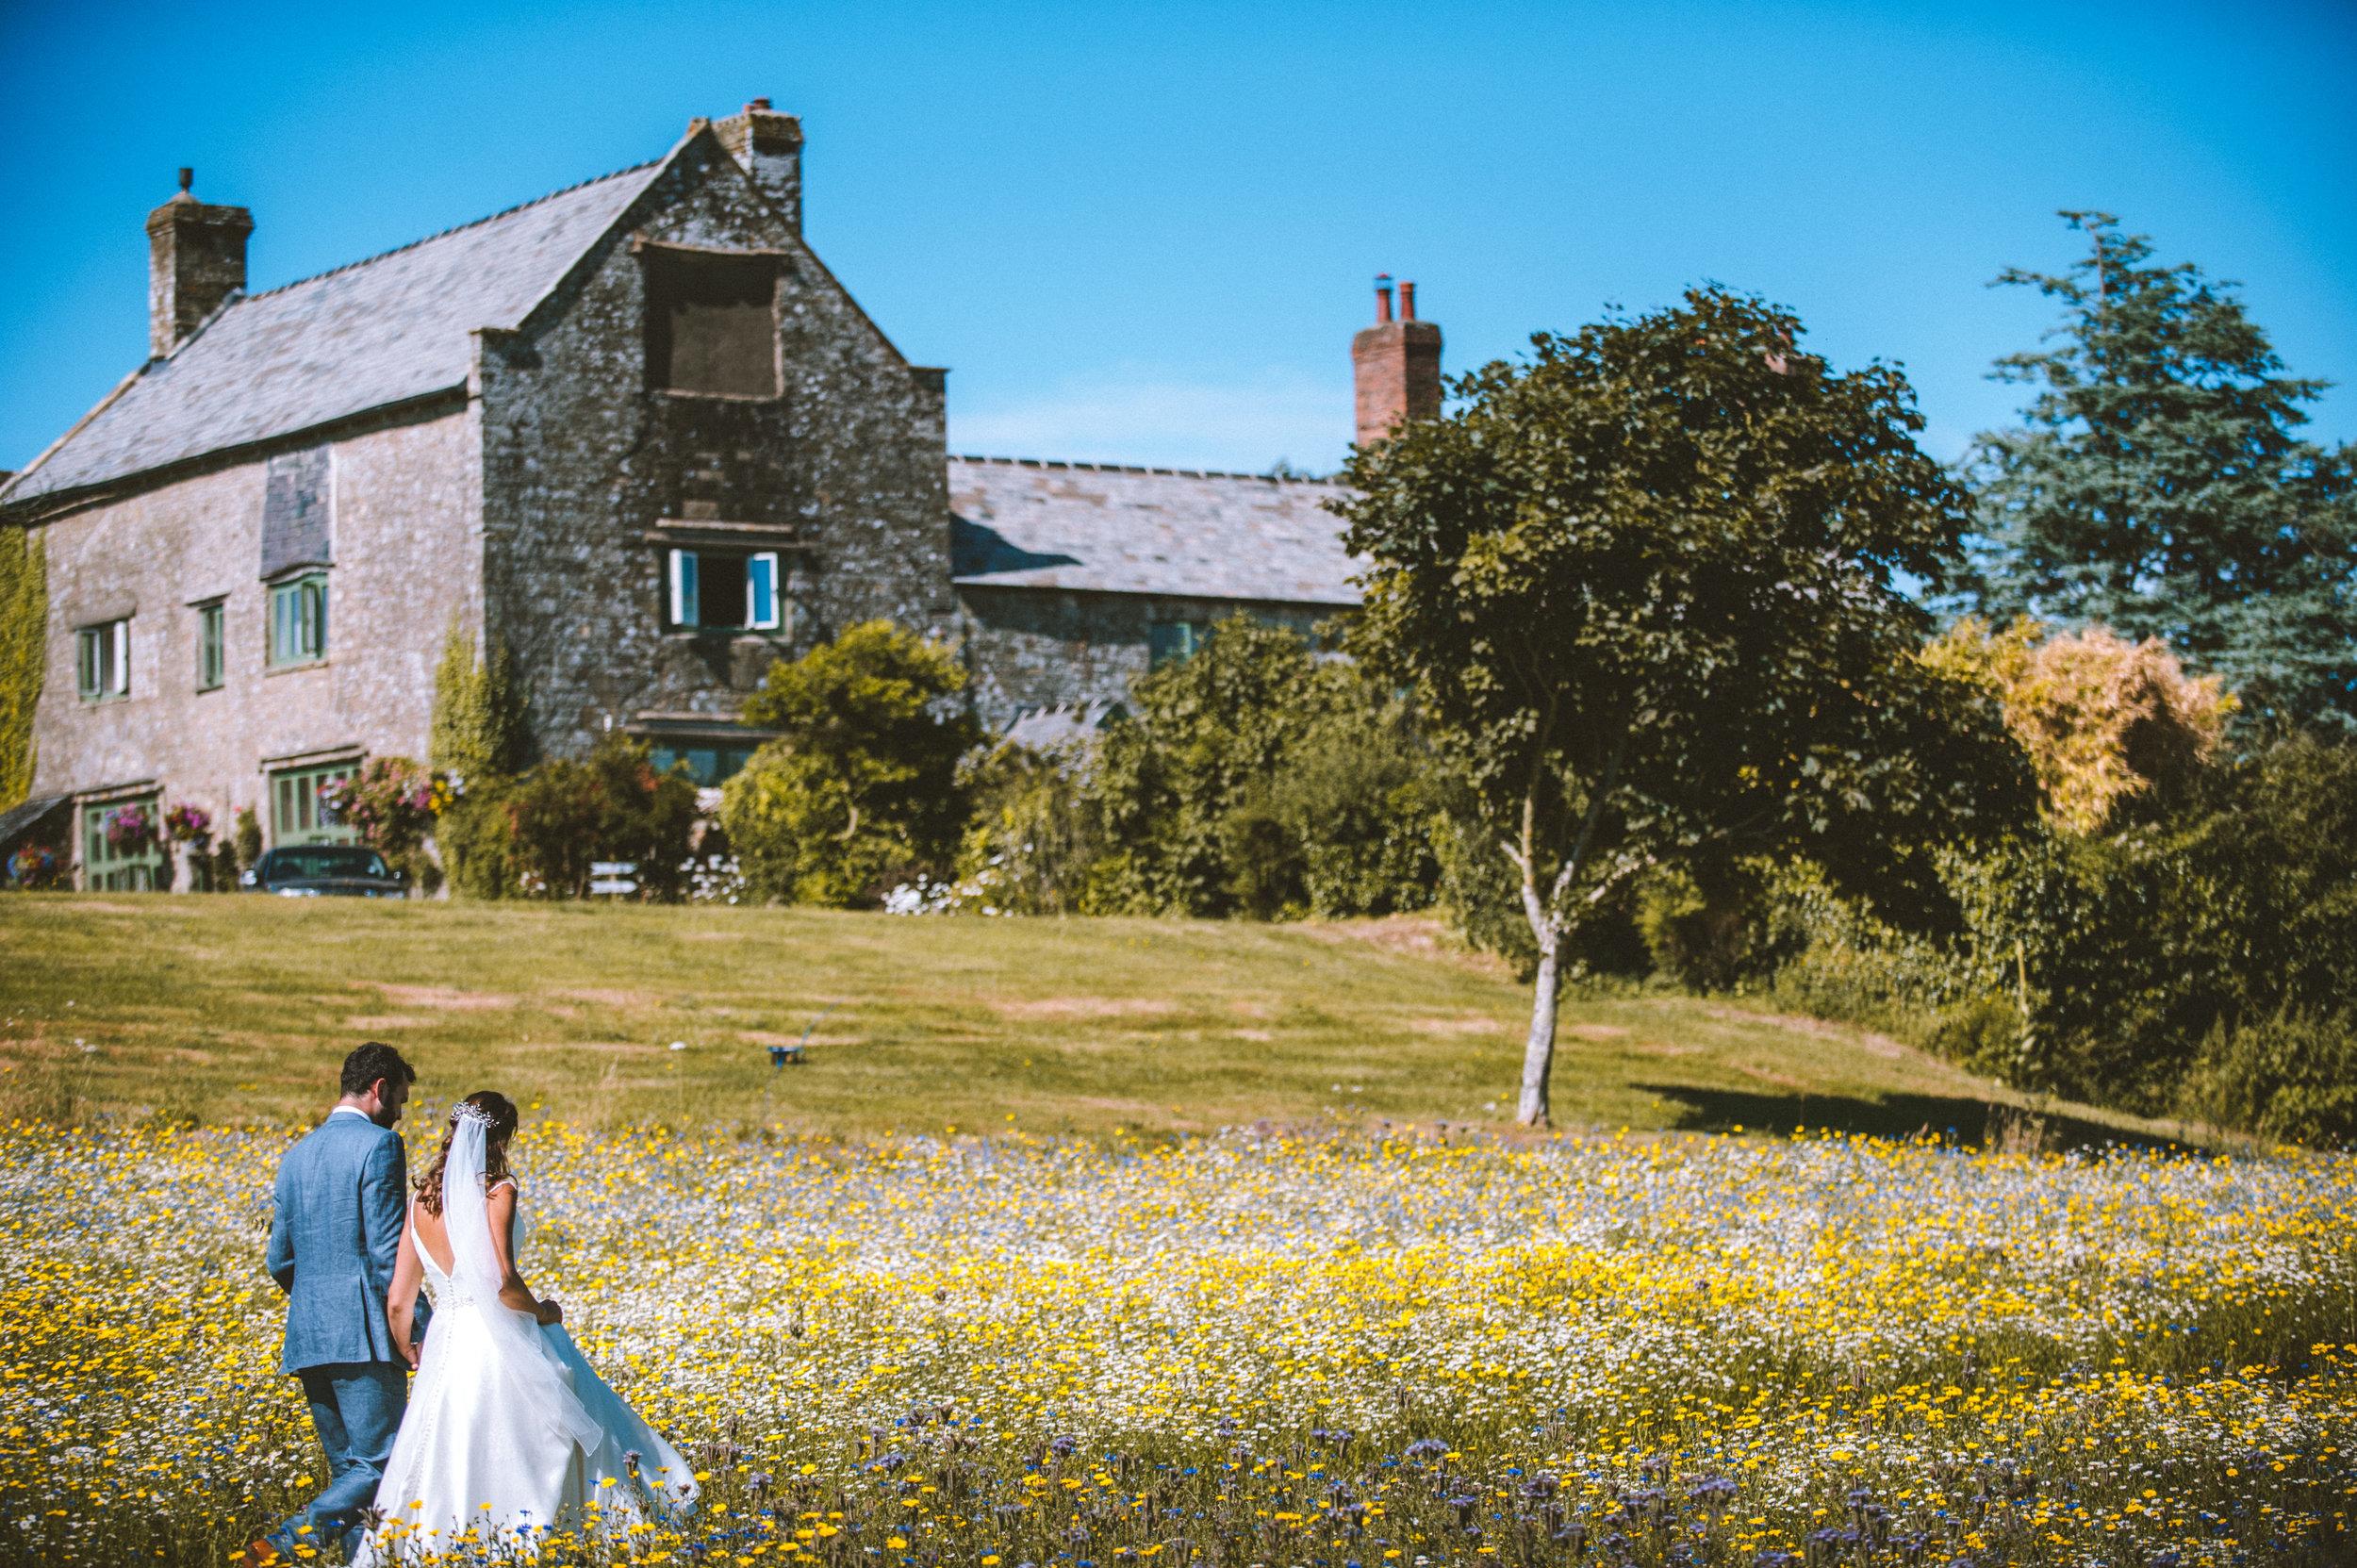 ash-barton-estate-wedding-photographer-mark-shaw-34.jpg